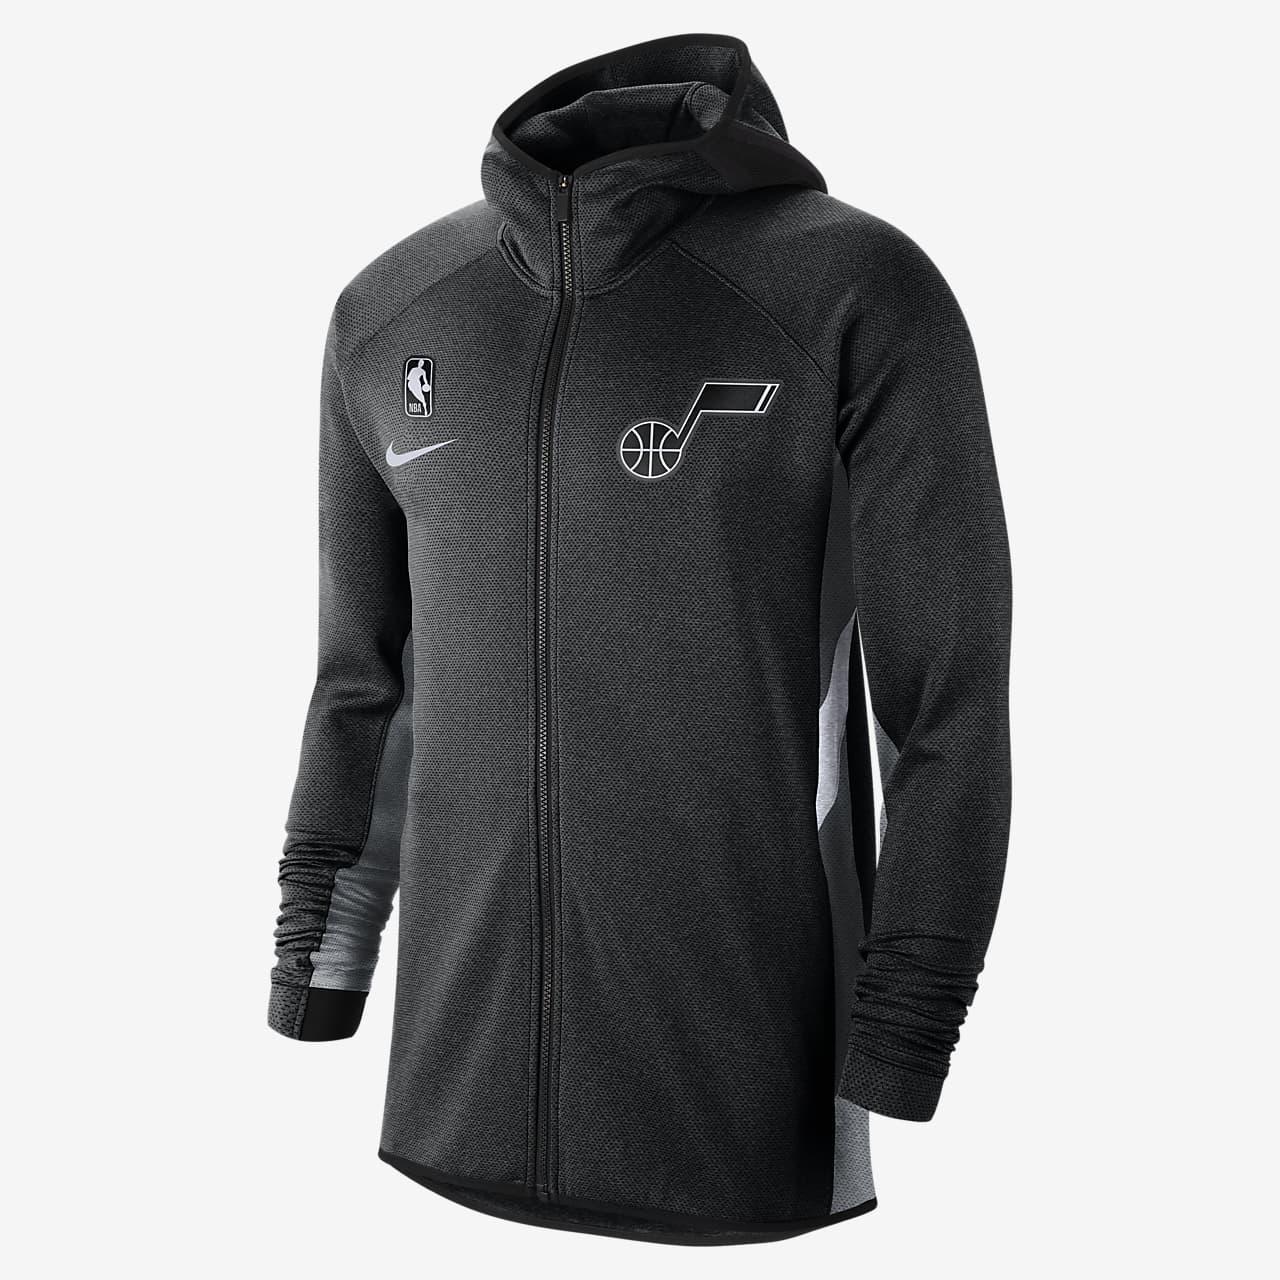 Utah Jazz Nike Therma Flex Showtime Men's NBA Hoodie